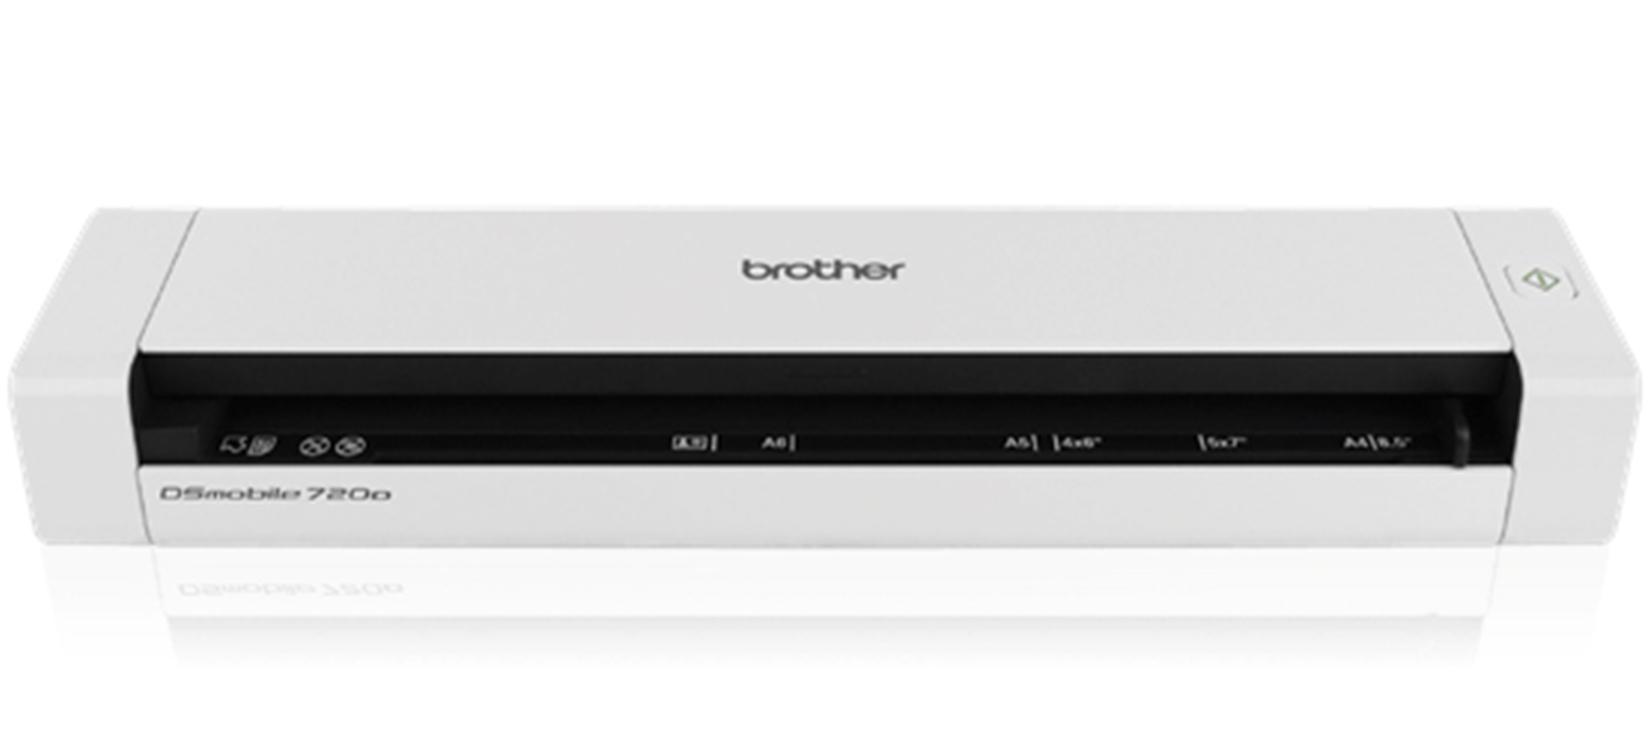 Máy quét Brother DS-720D